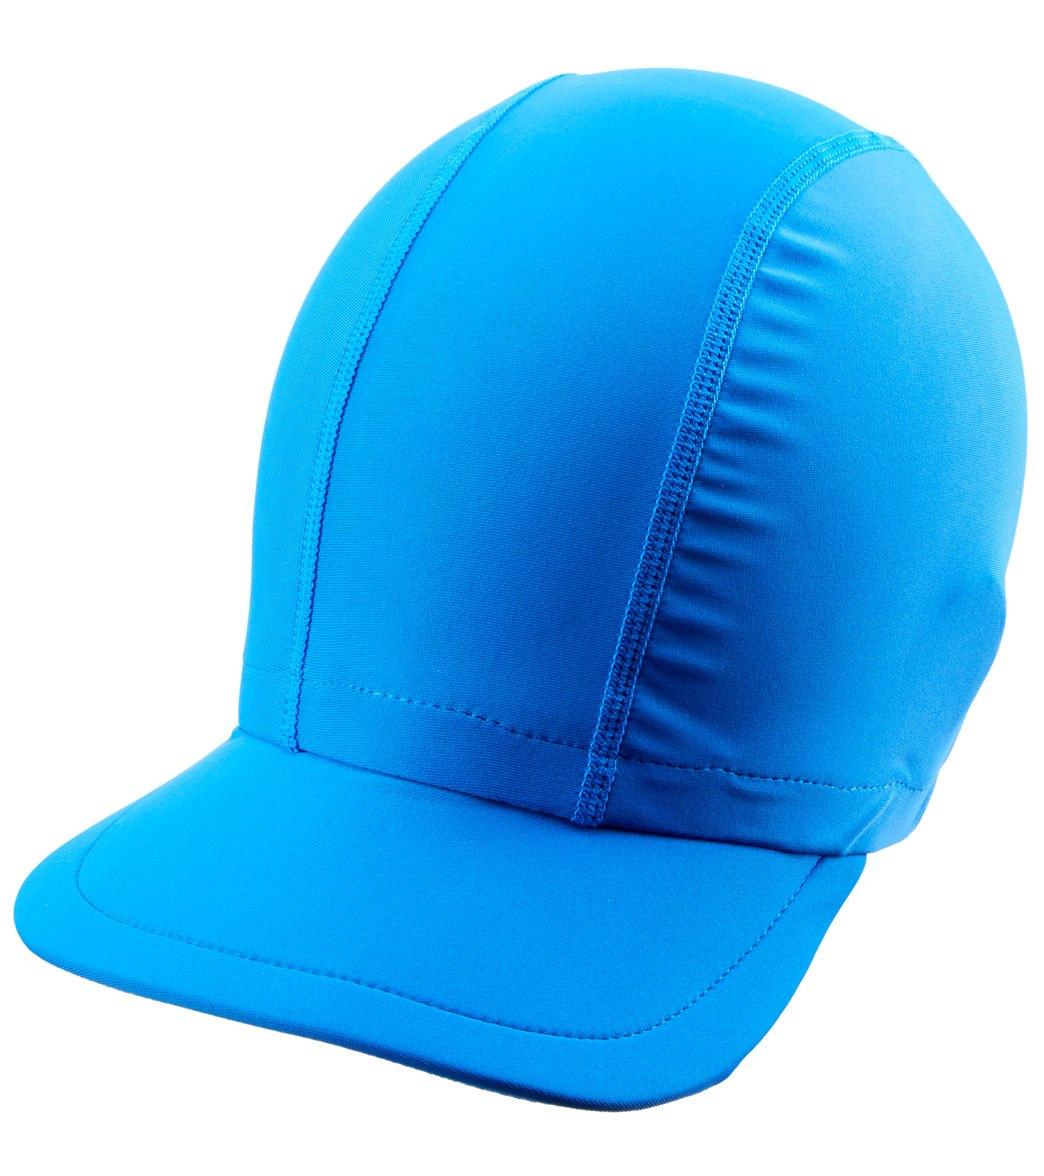 9cd623fa2745c Swimlids UPF 50+ Solid Adult Sun Hat at SwimOutlet.com